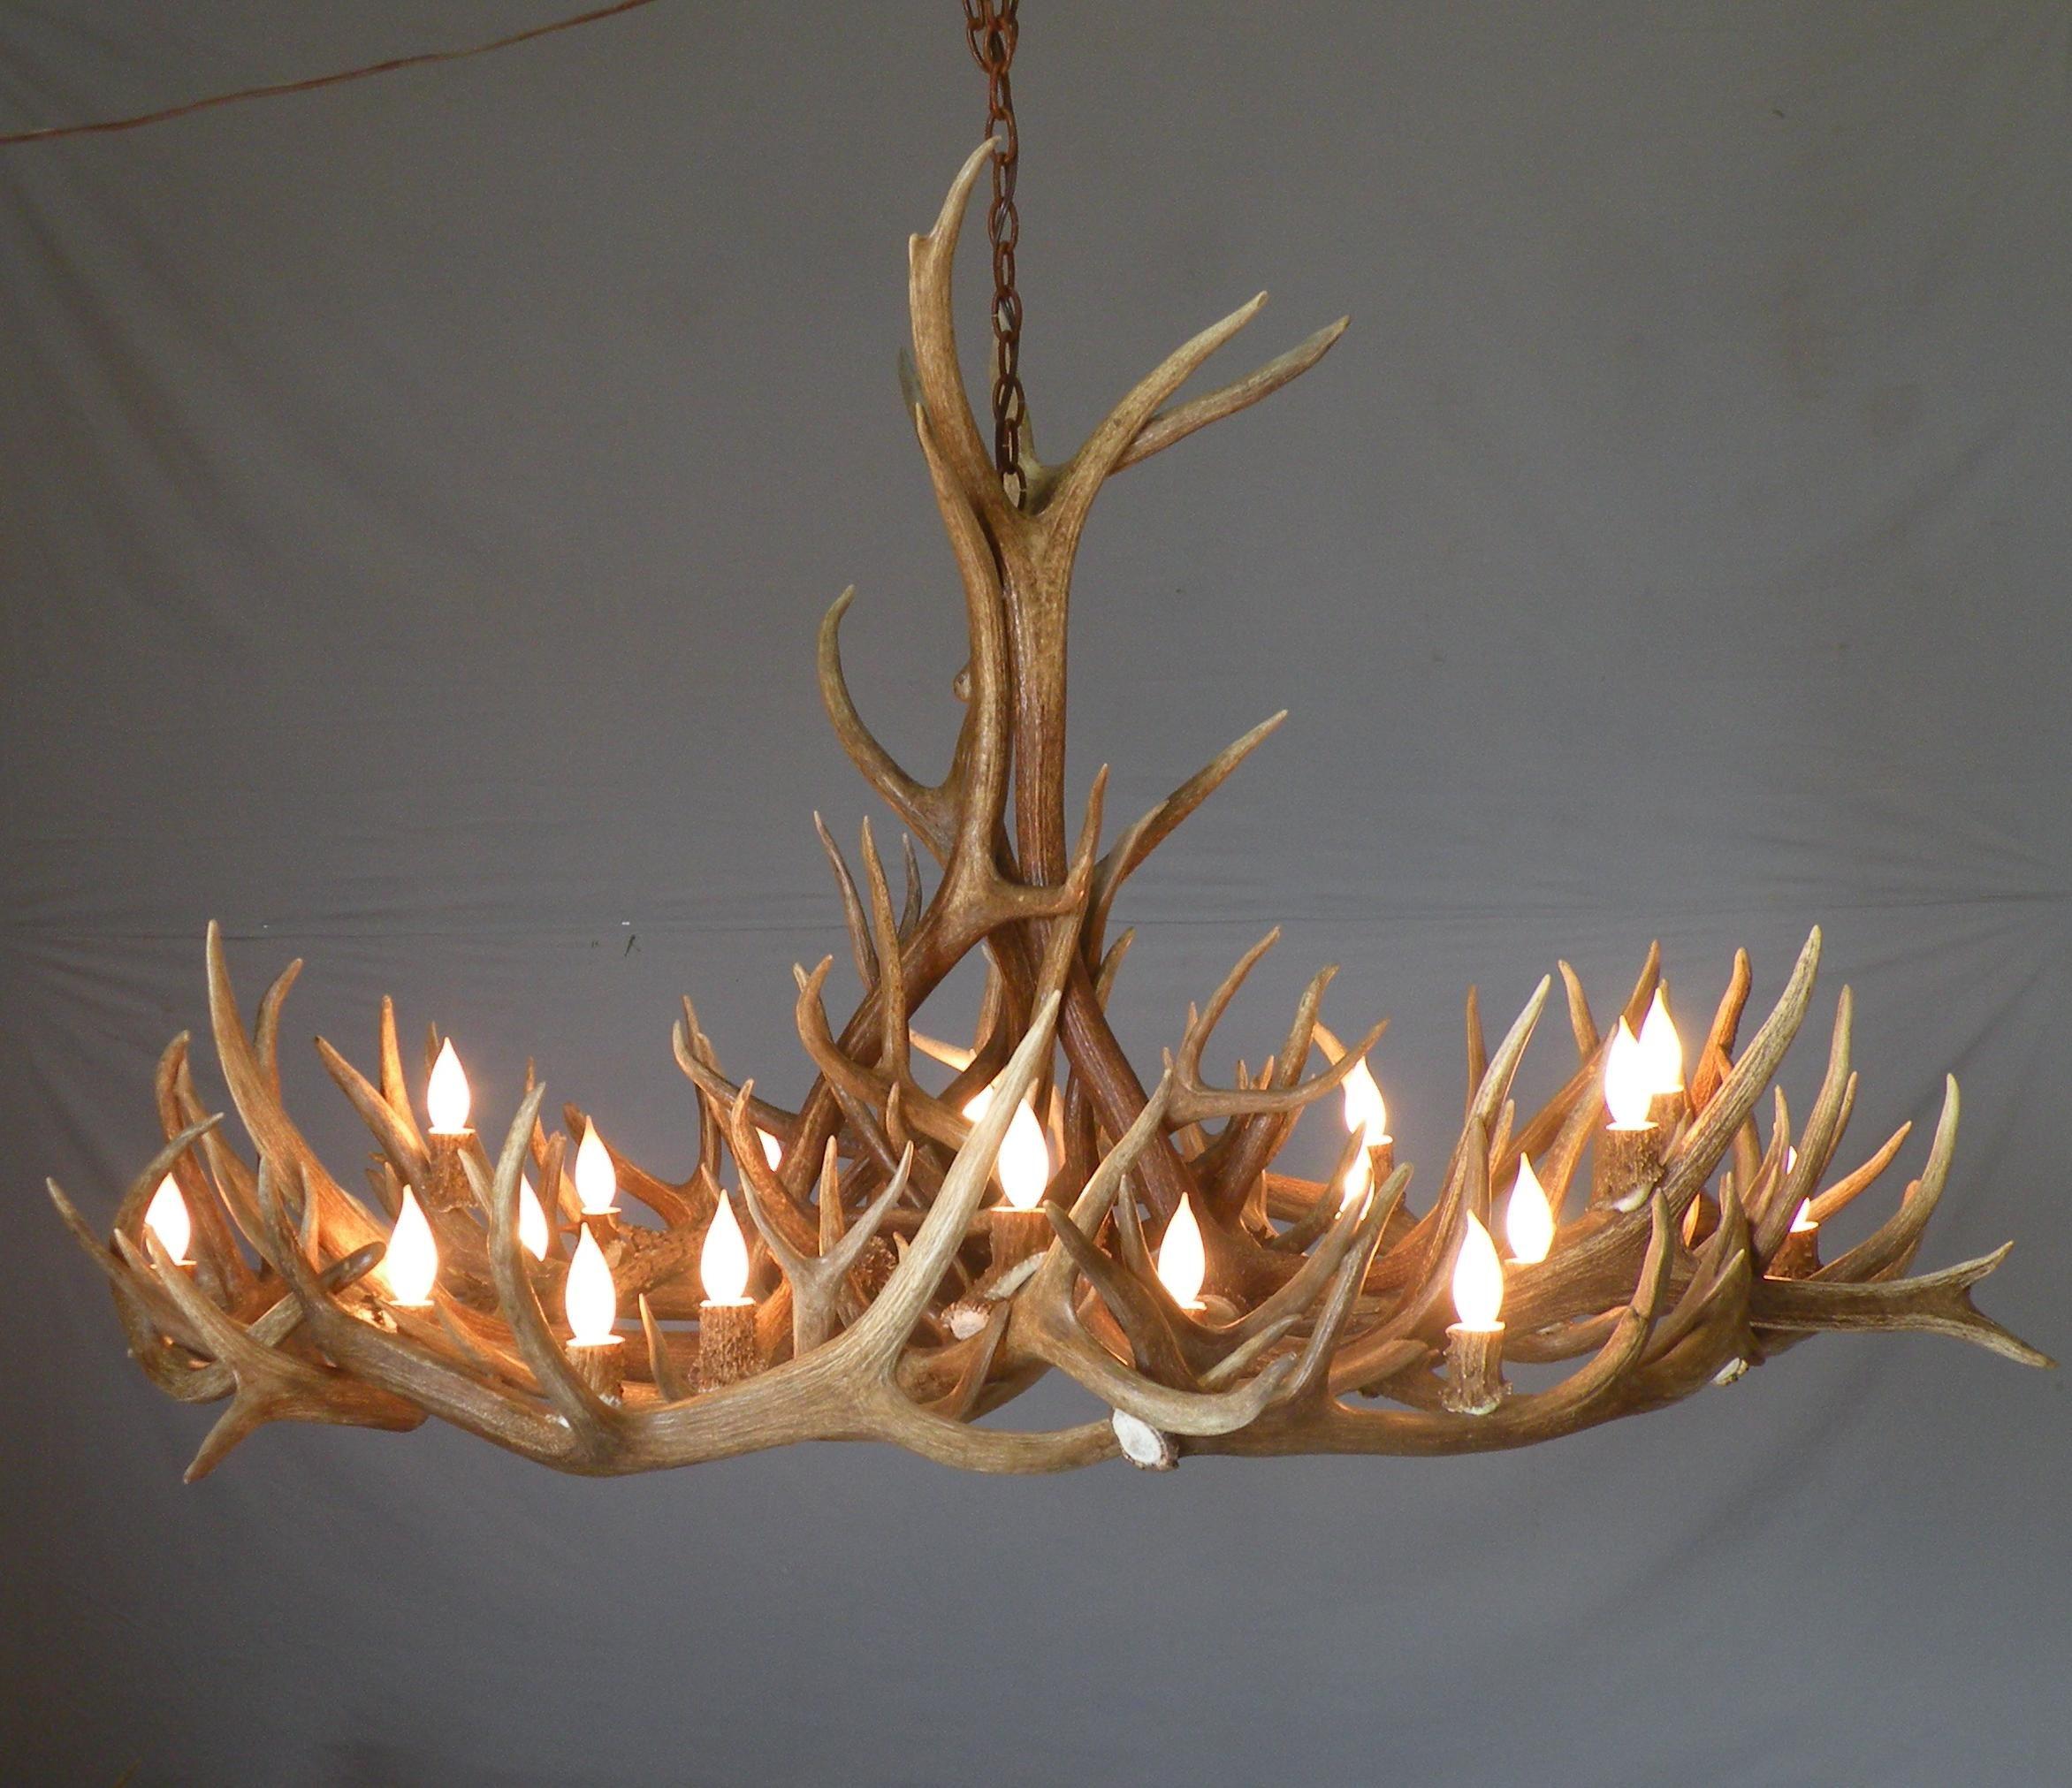 antler chandeliers by wdc returning artist peak antlers accents cabin rustic